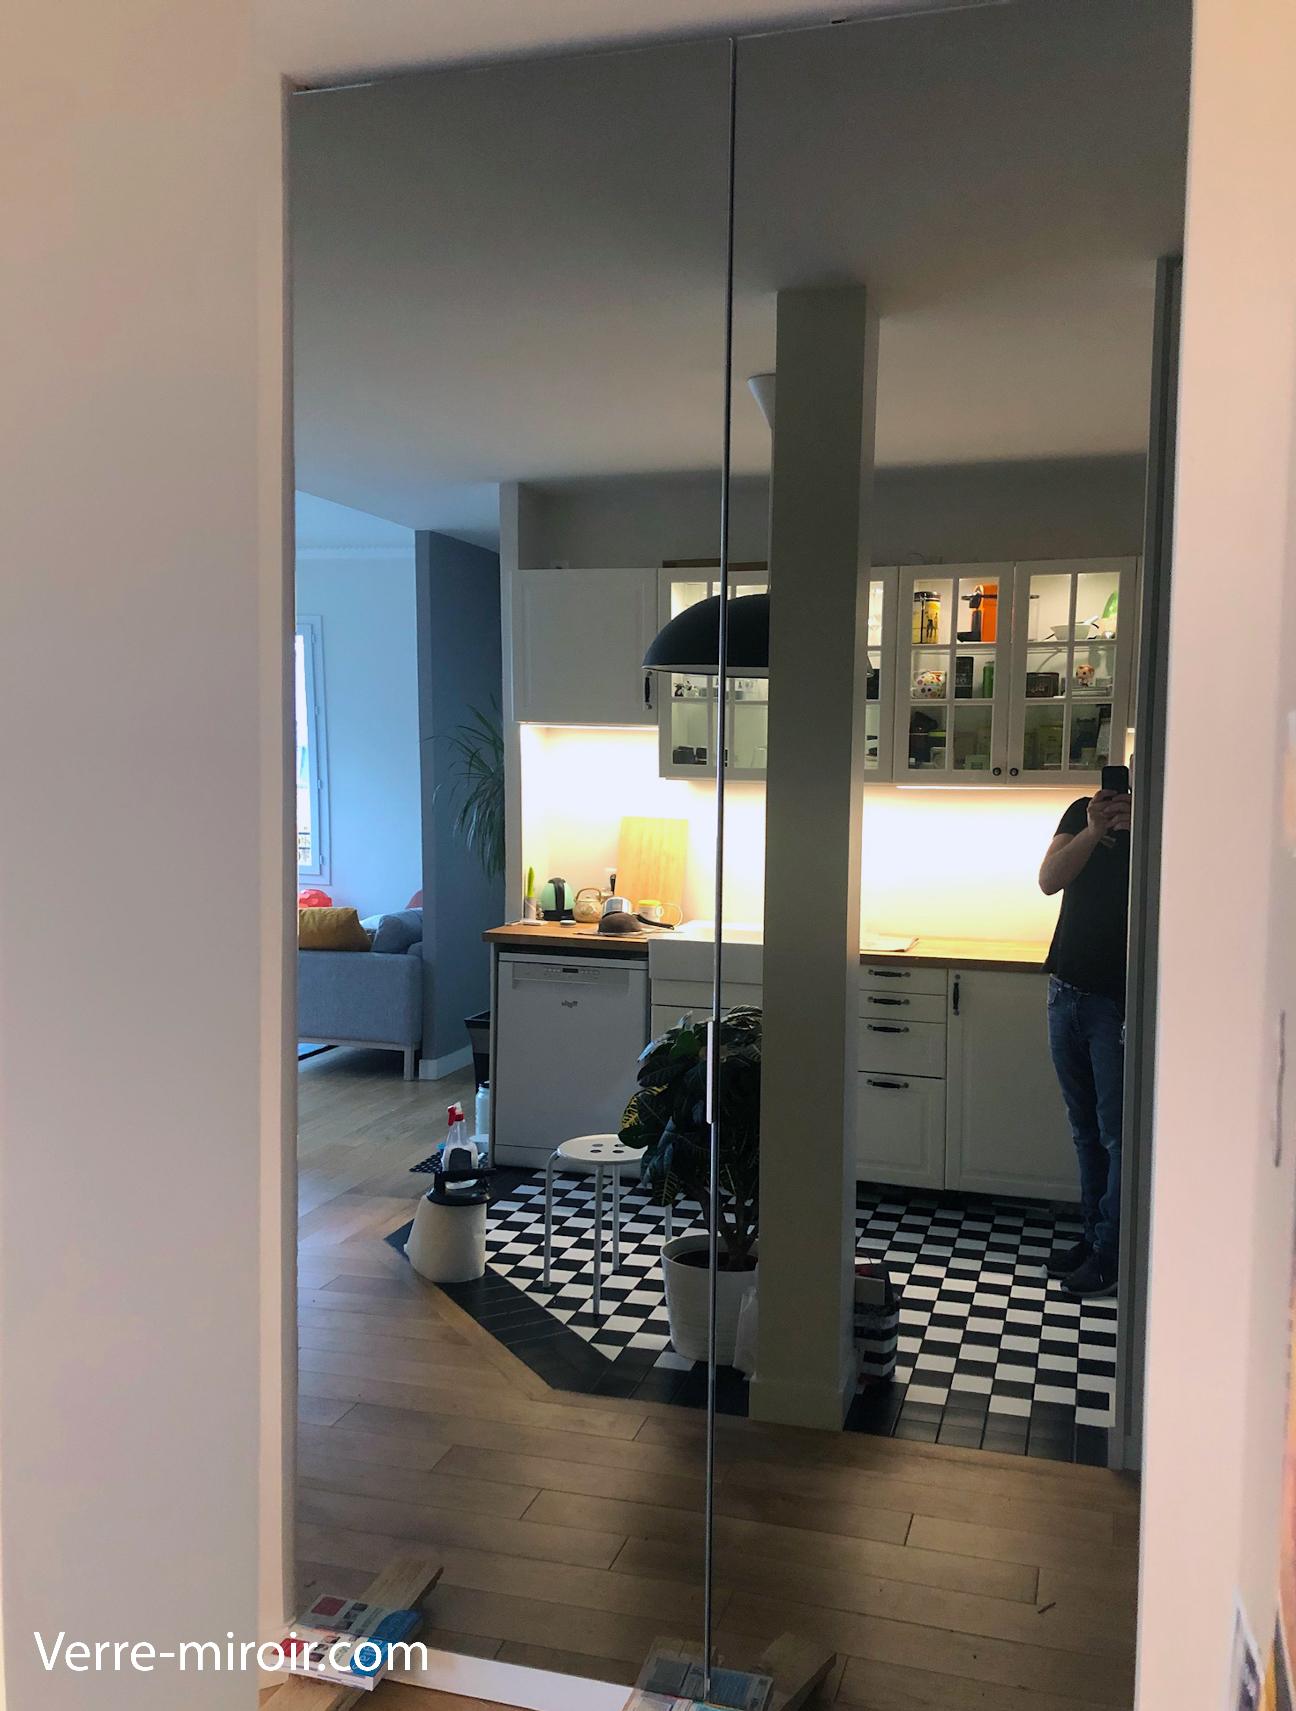 Porte miroir gris